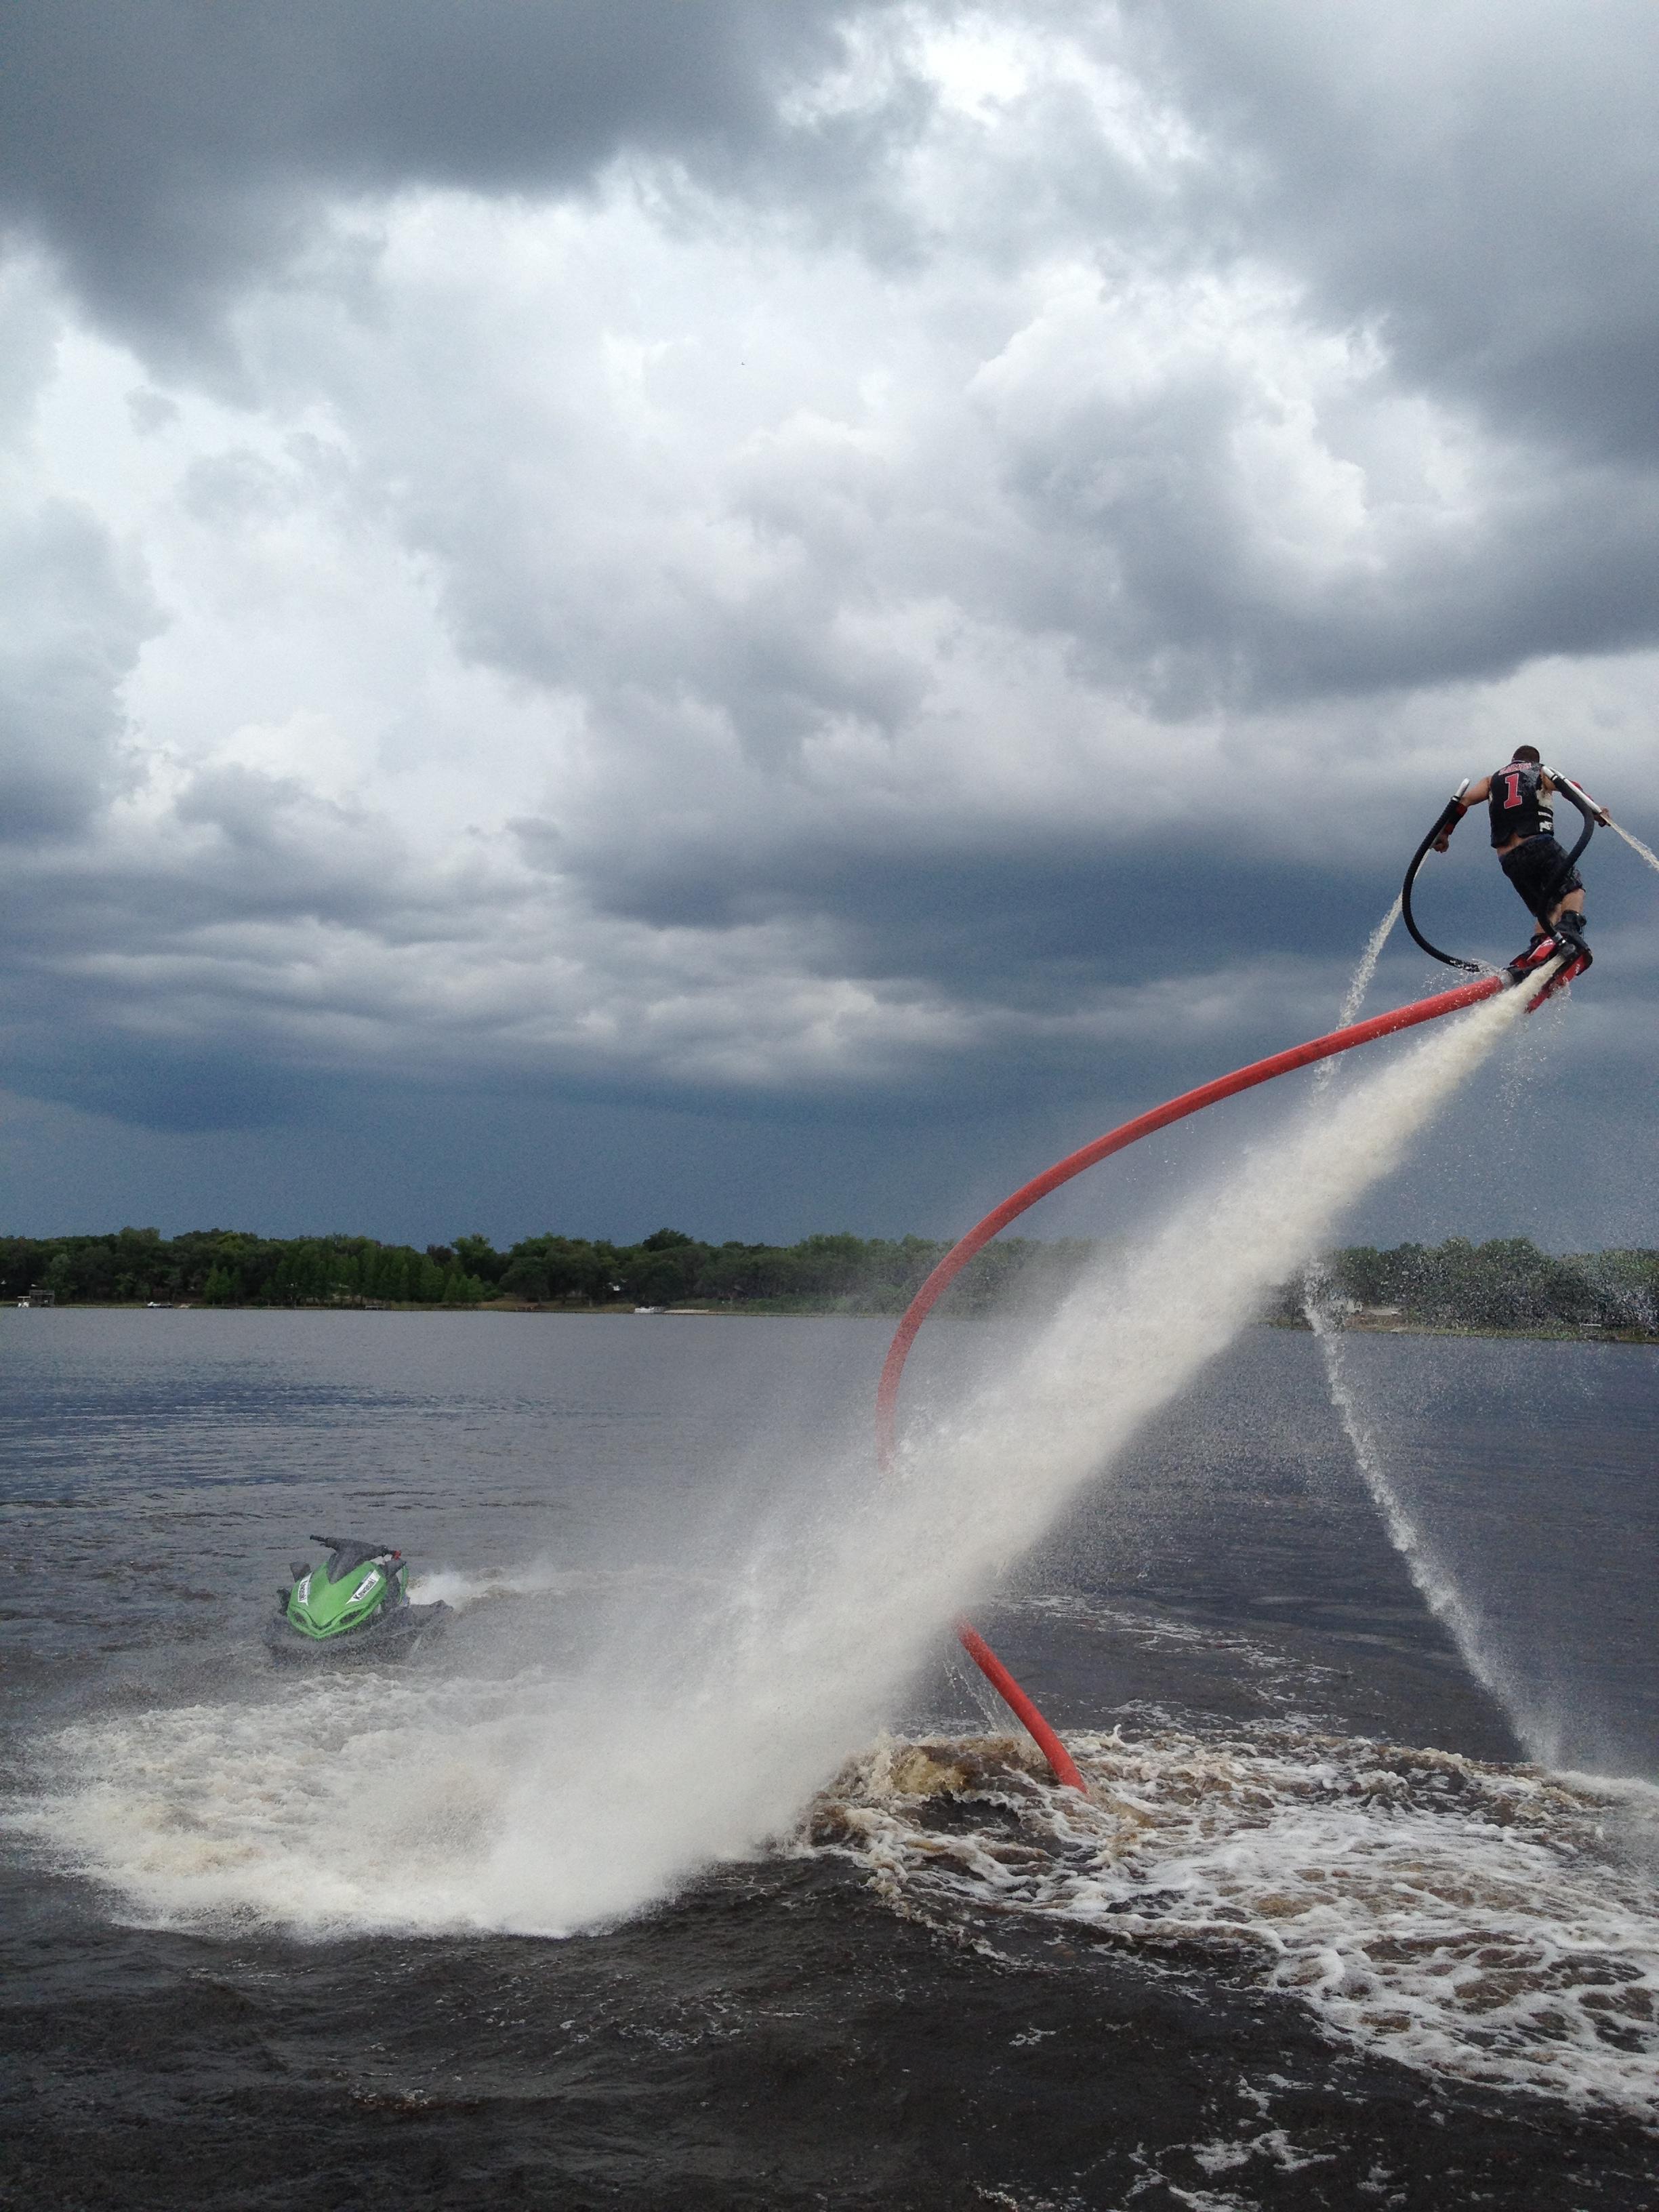 Flyboard Maneuverability